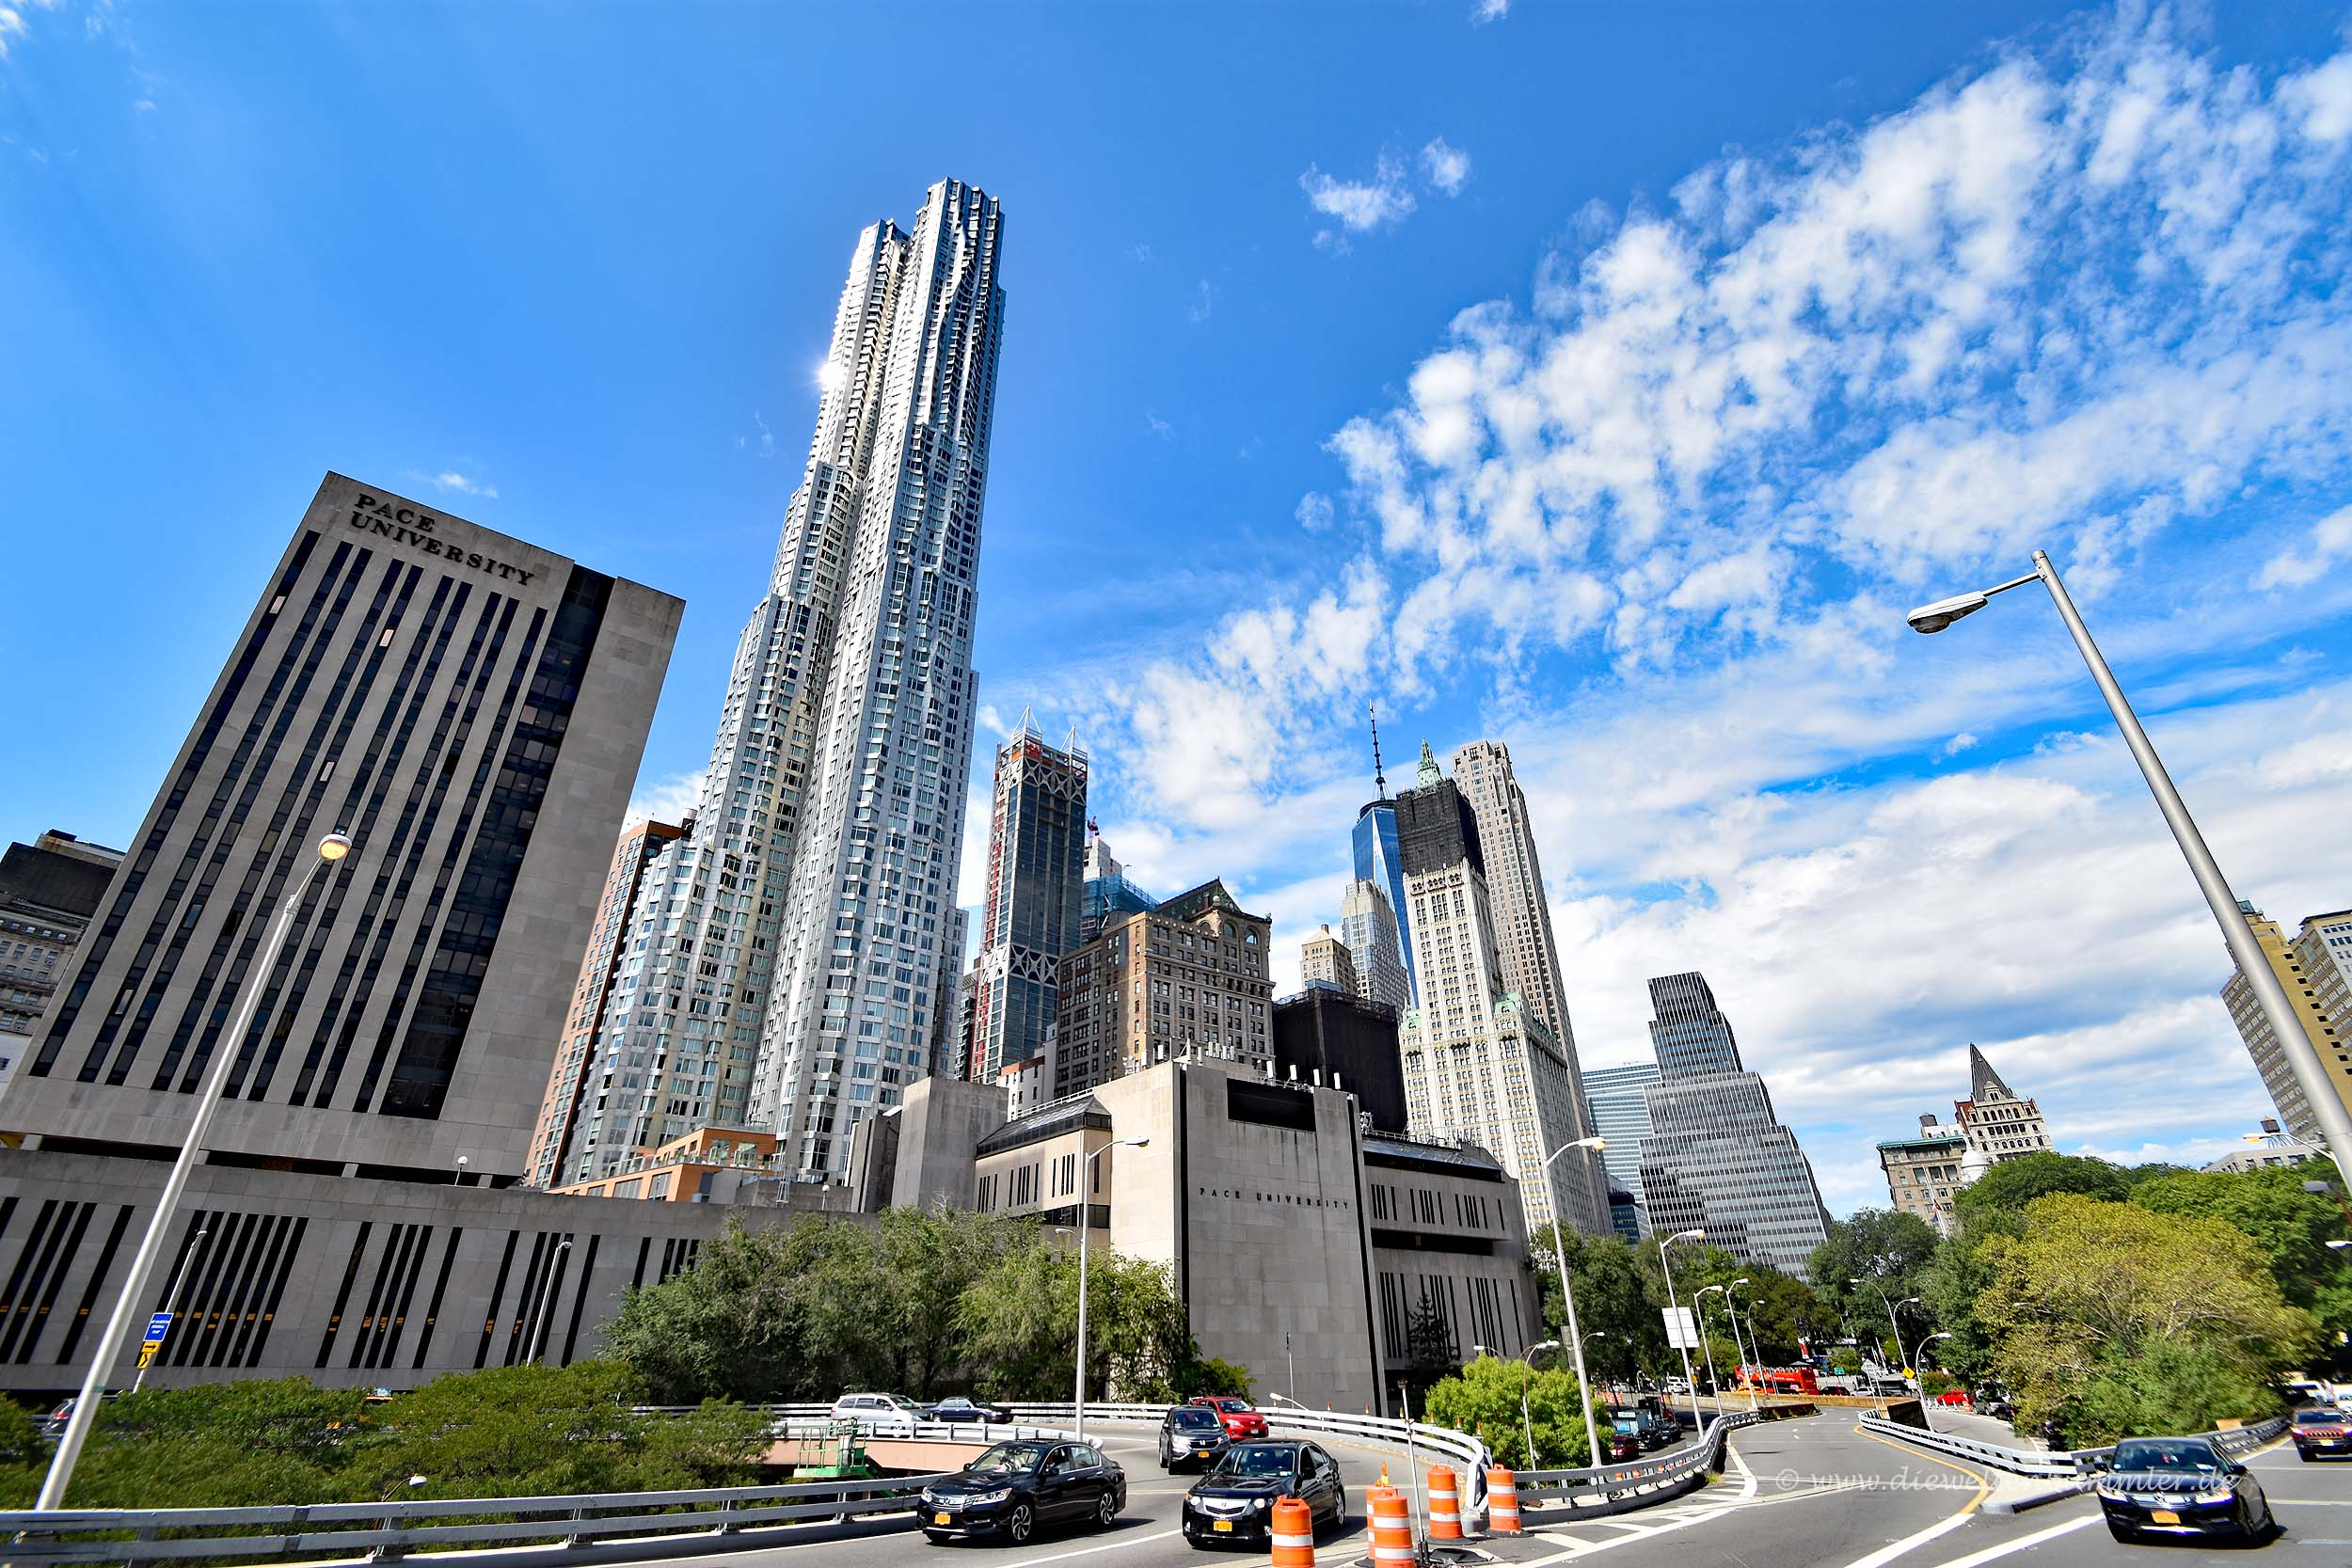 Beekman Tower alias 8 Spruce Street